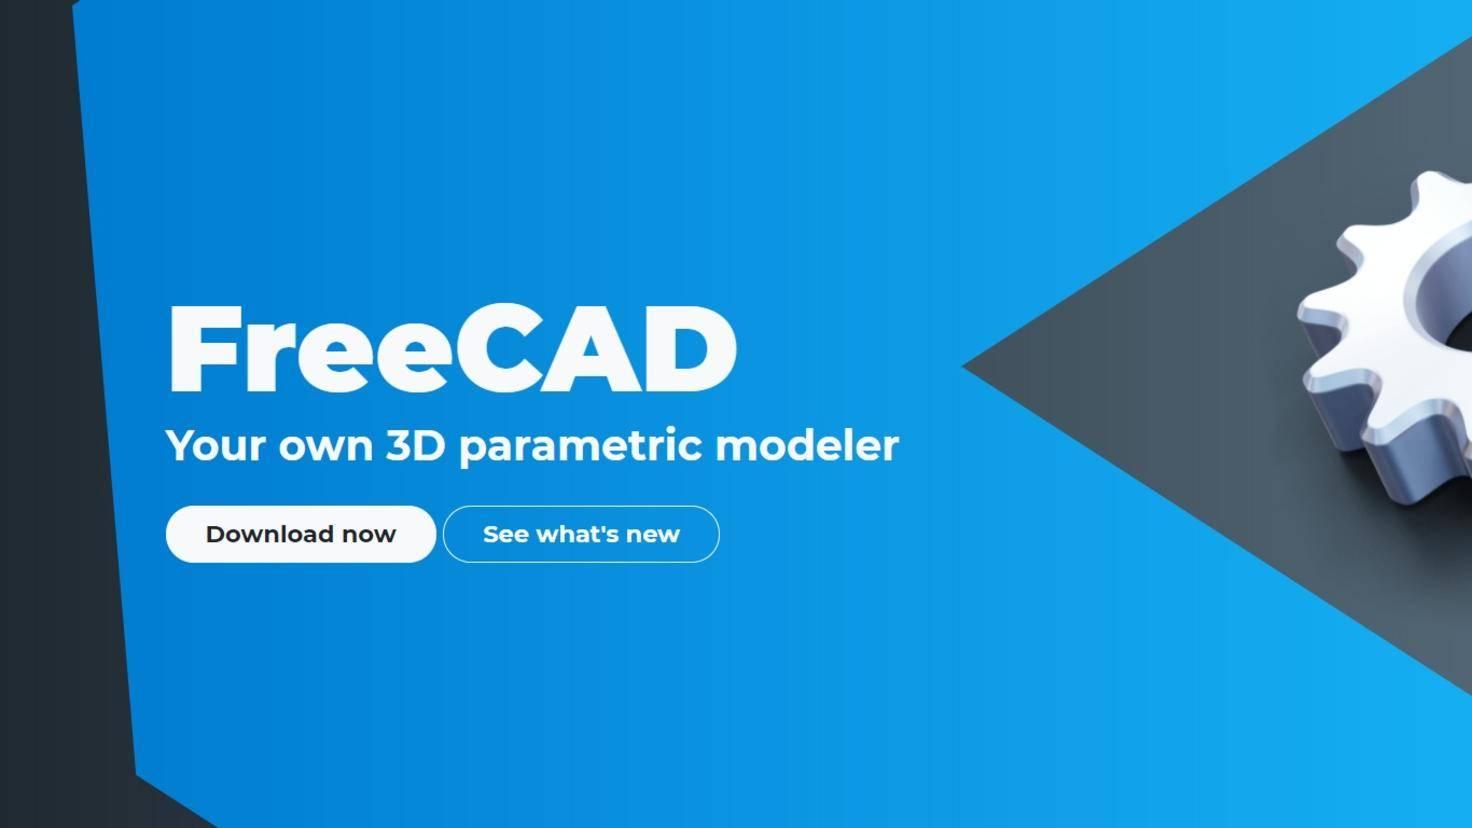 freecad 3d printer software